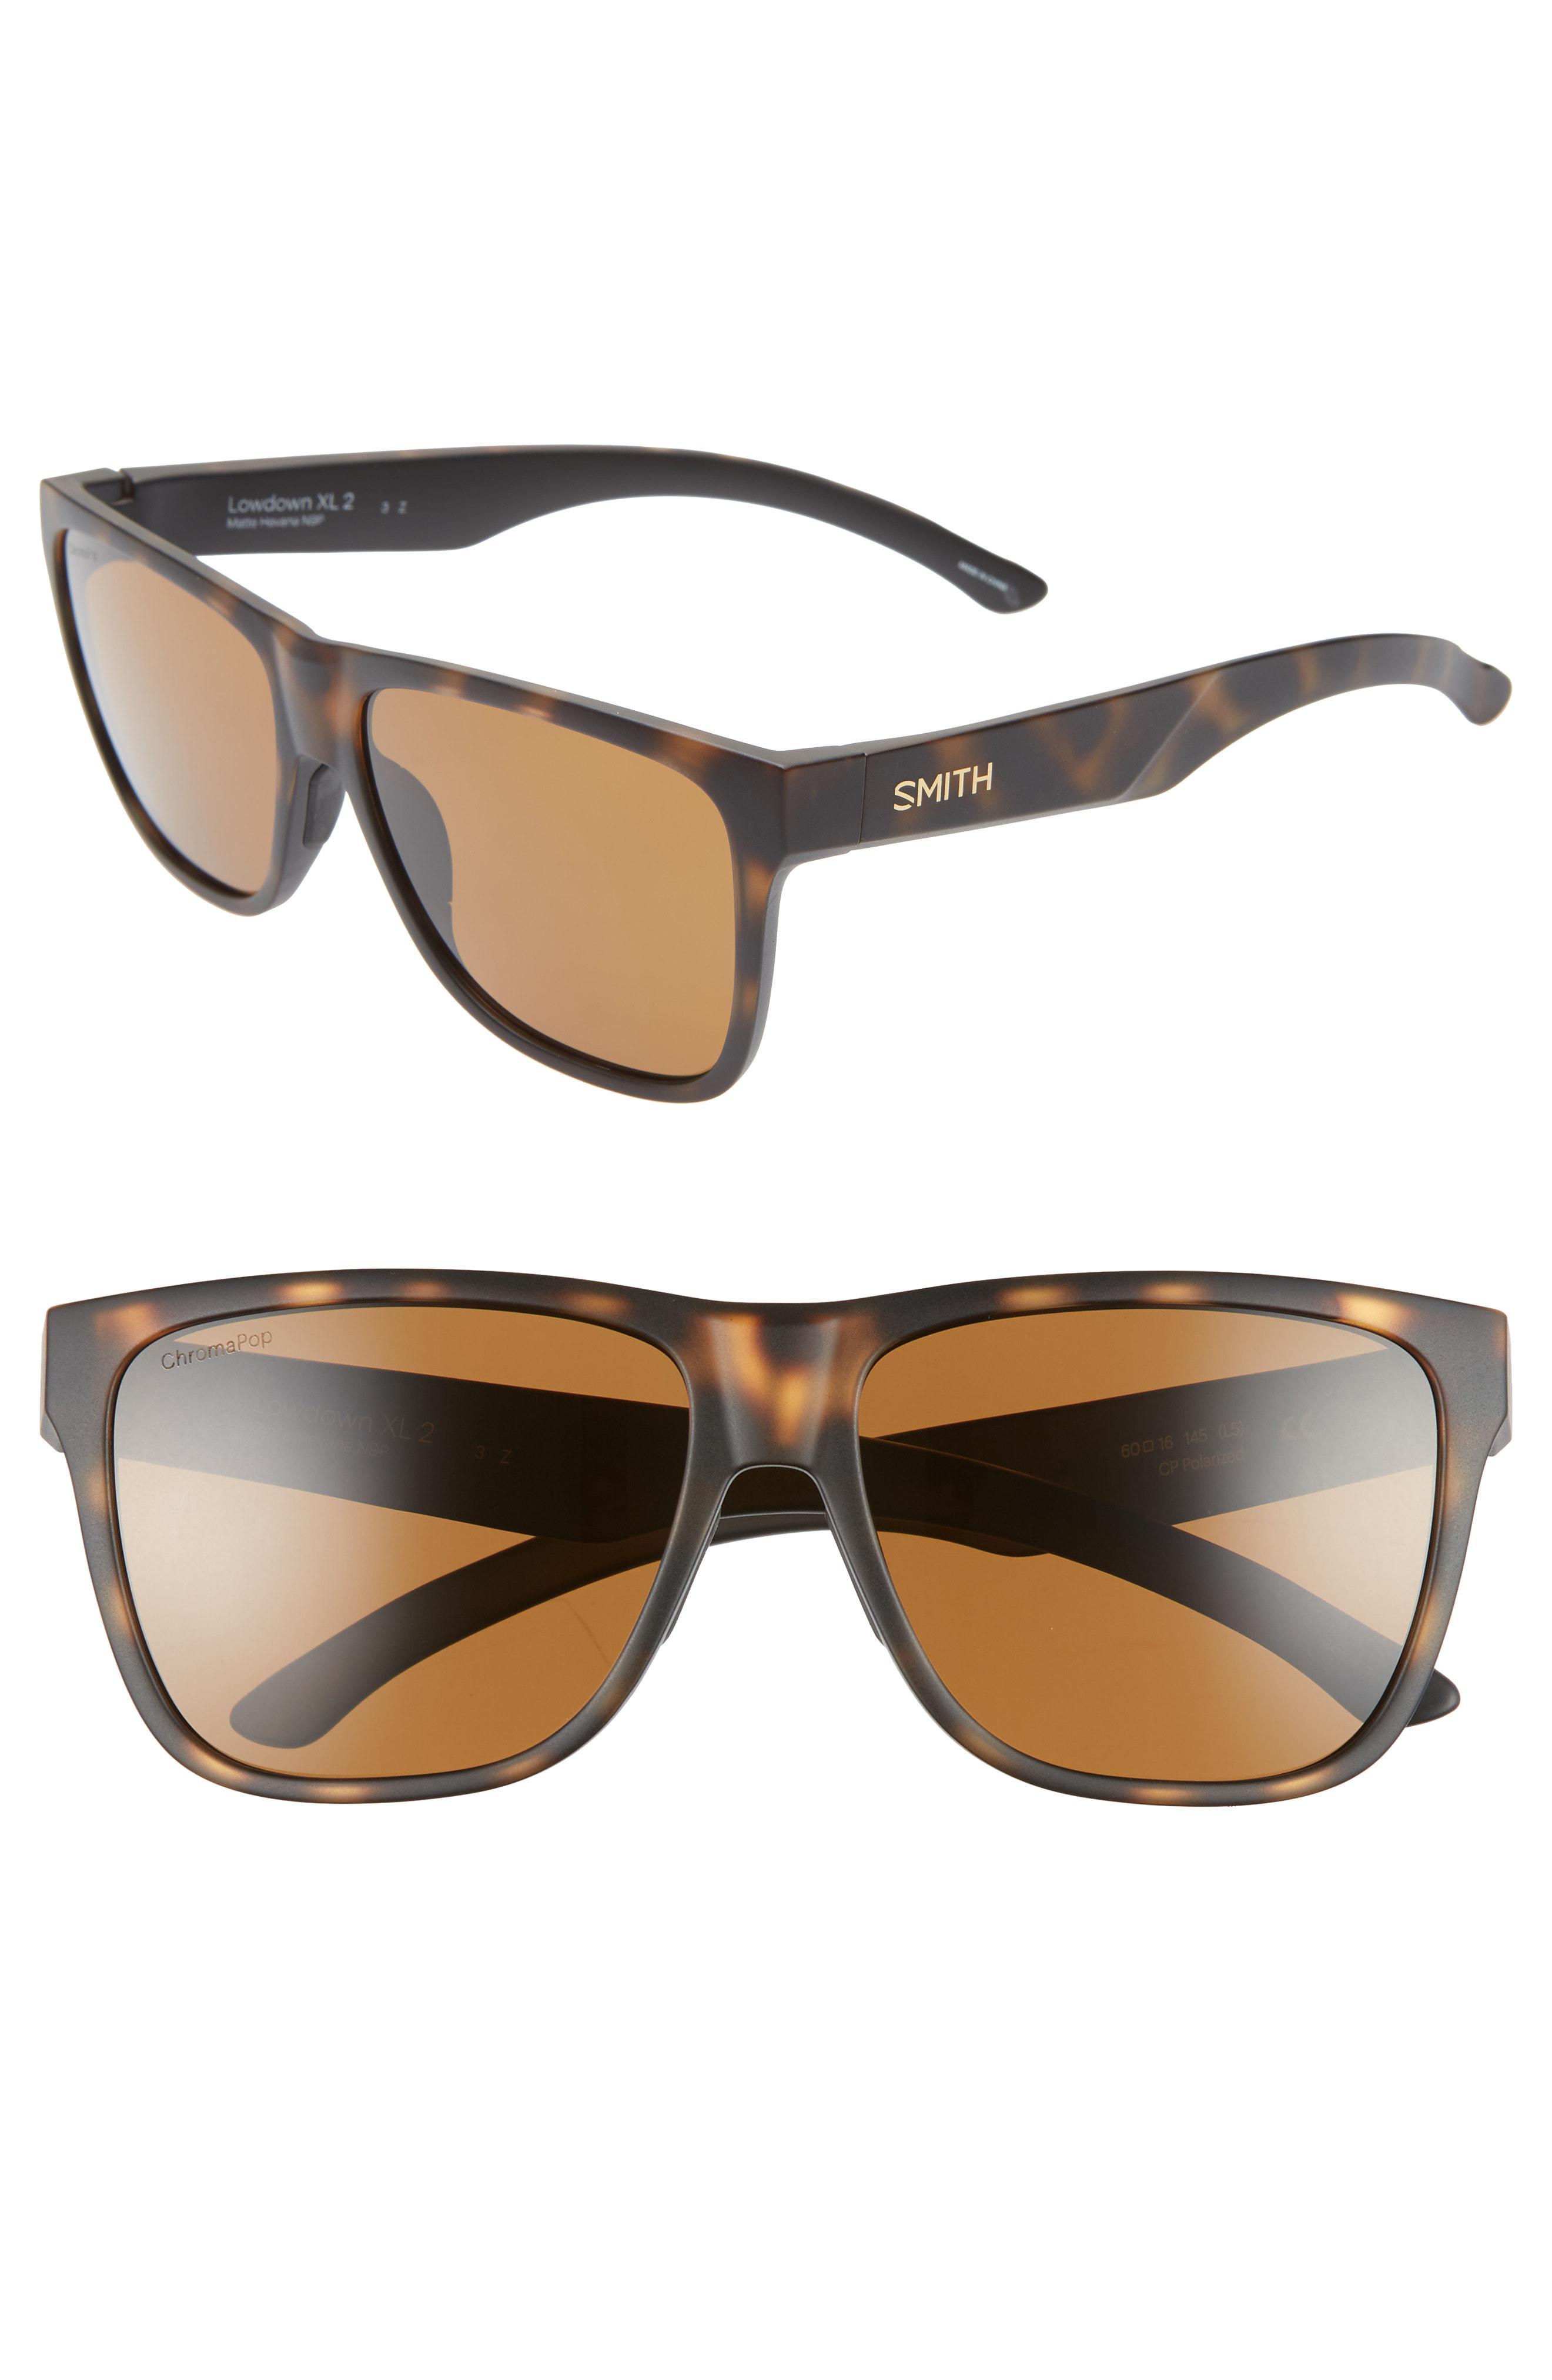 df8bc04444e Smith - Brown Lowdown Xl 2 60mm Chromapop(tm) Square Sunglasses - Lyst.  View fullscreen